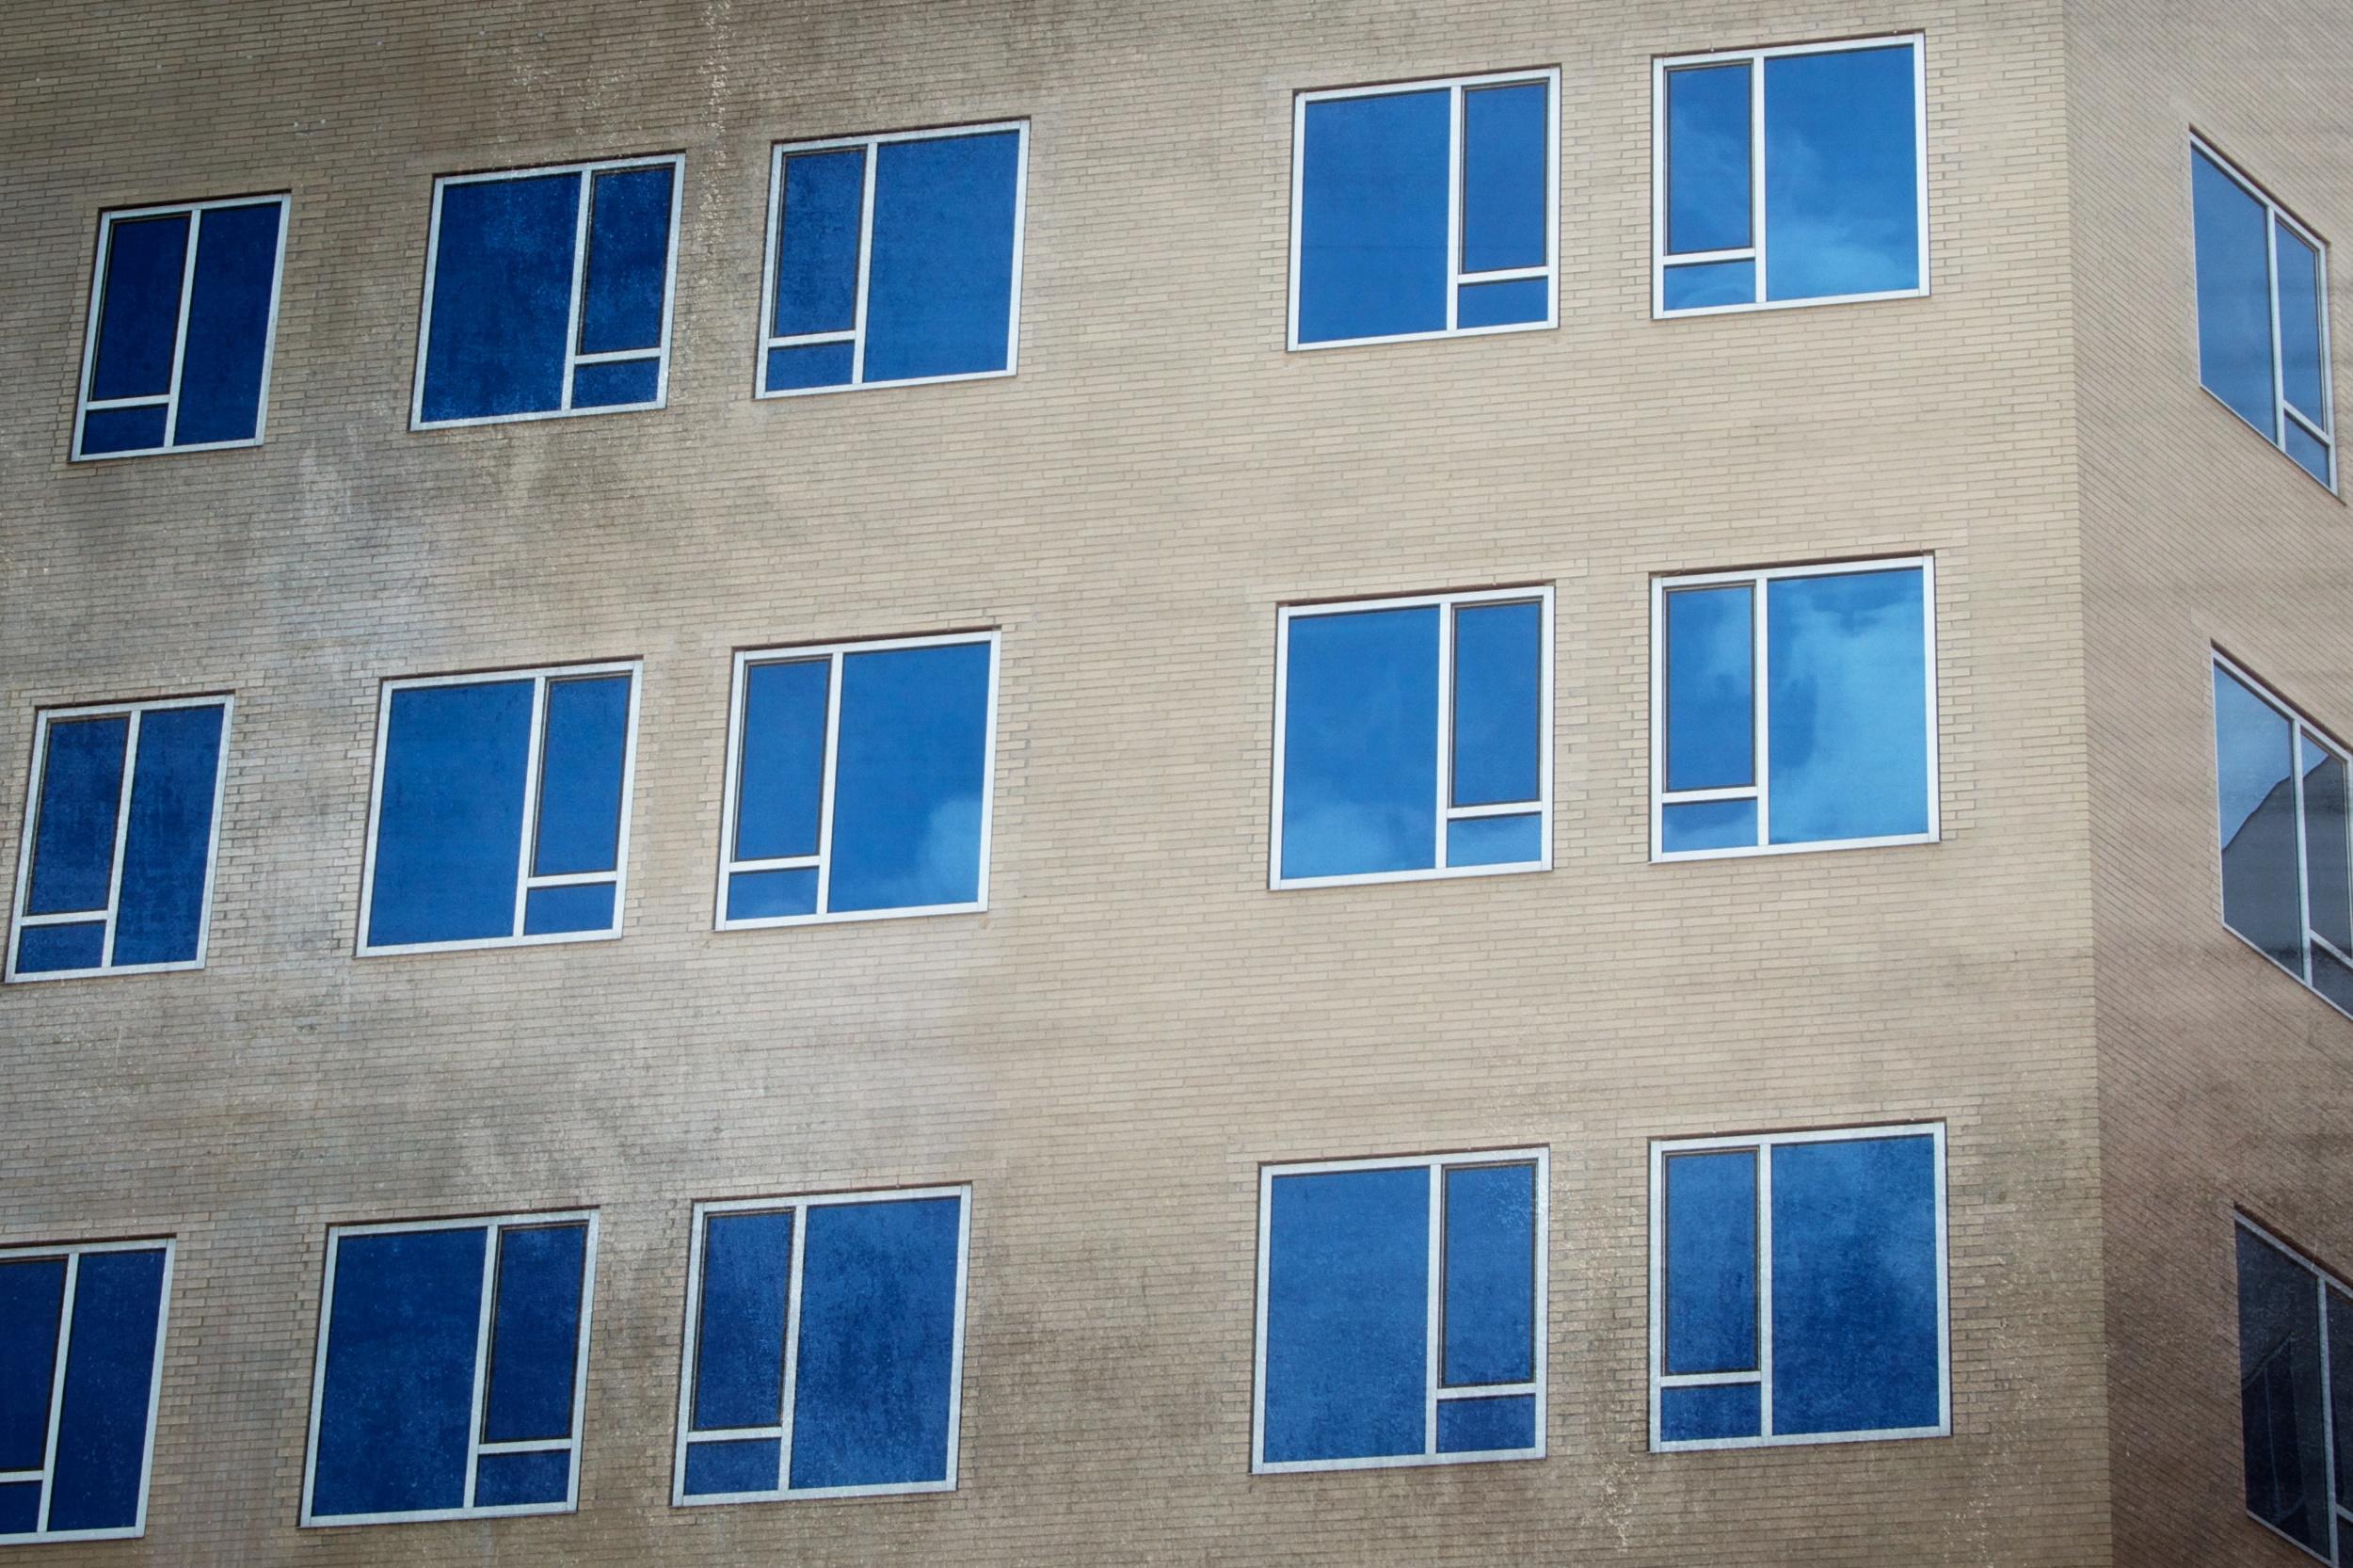 Clouds in Windows.jpg